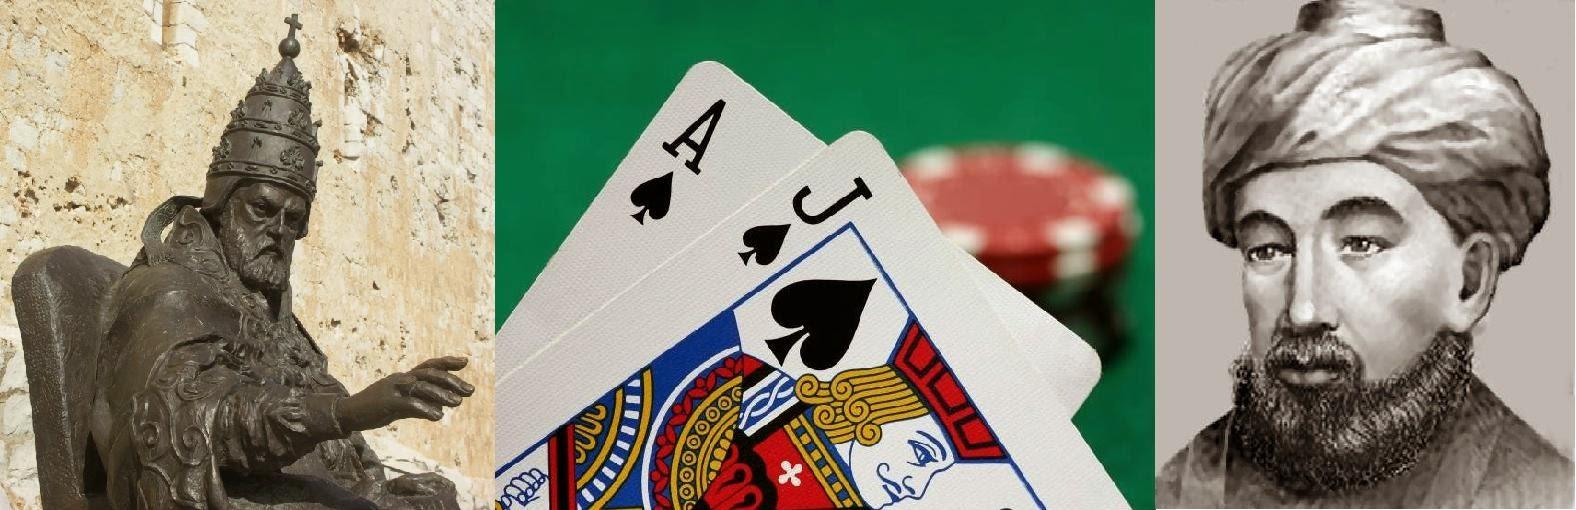 Benedicto+XIII+Blackjack+quince+Maimonides